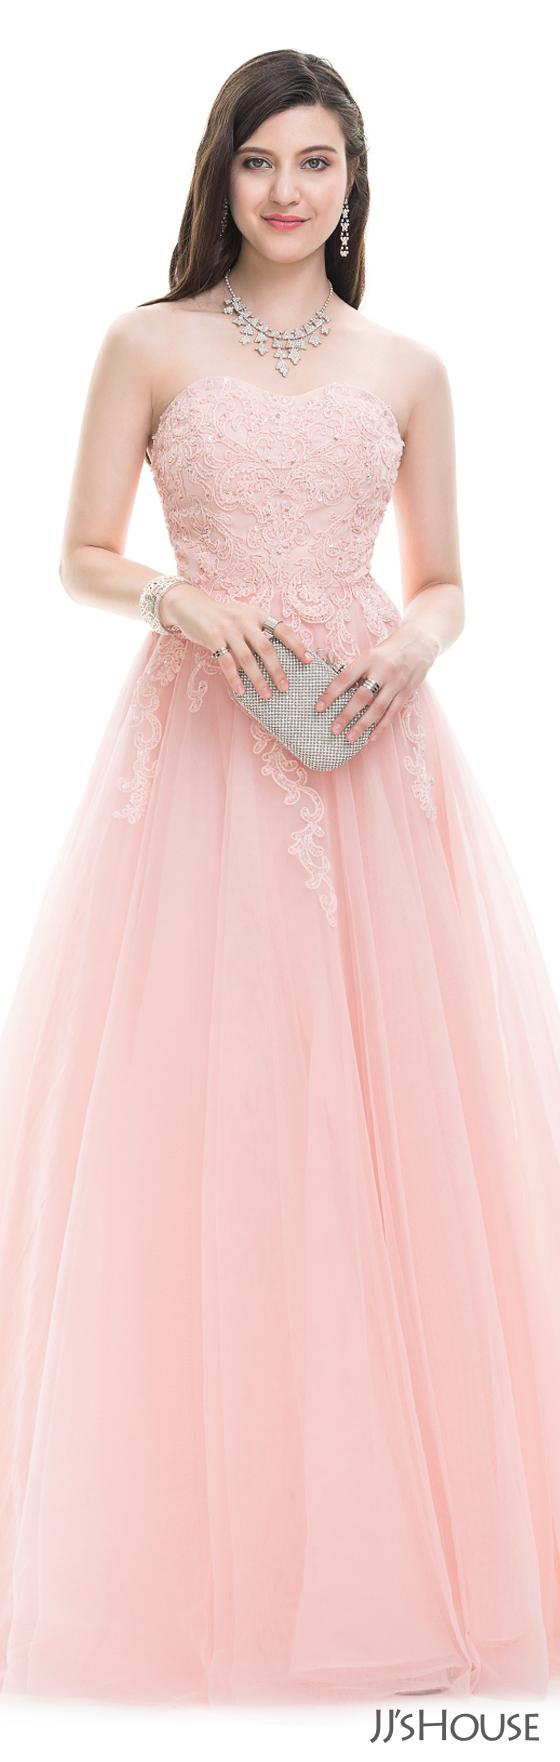 JJsHouse #Prom | Vestidos | Pinterest | Vestiditos, Vestido largo y ...